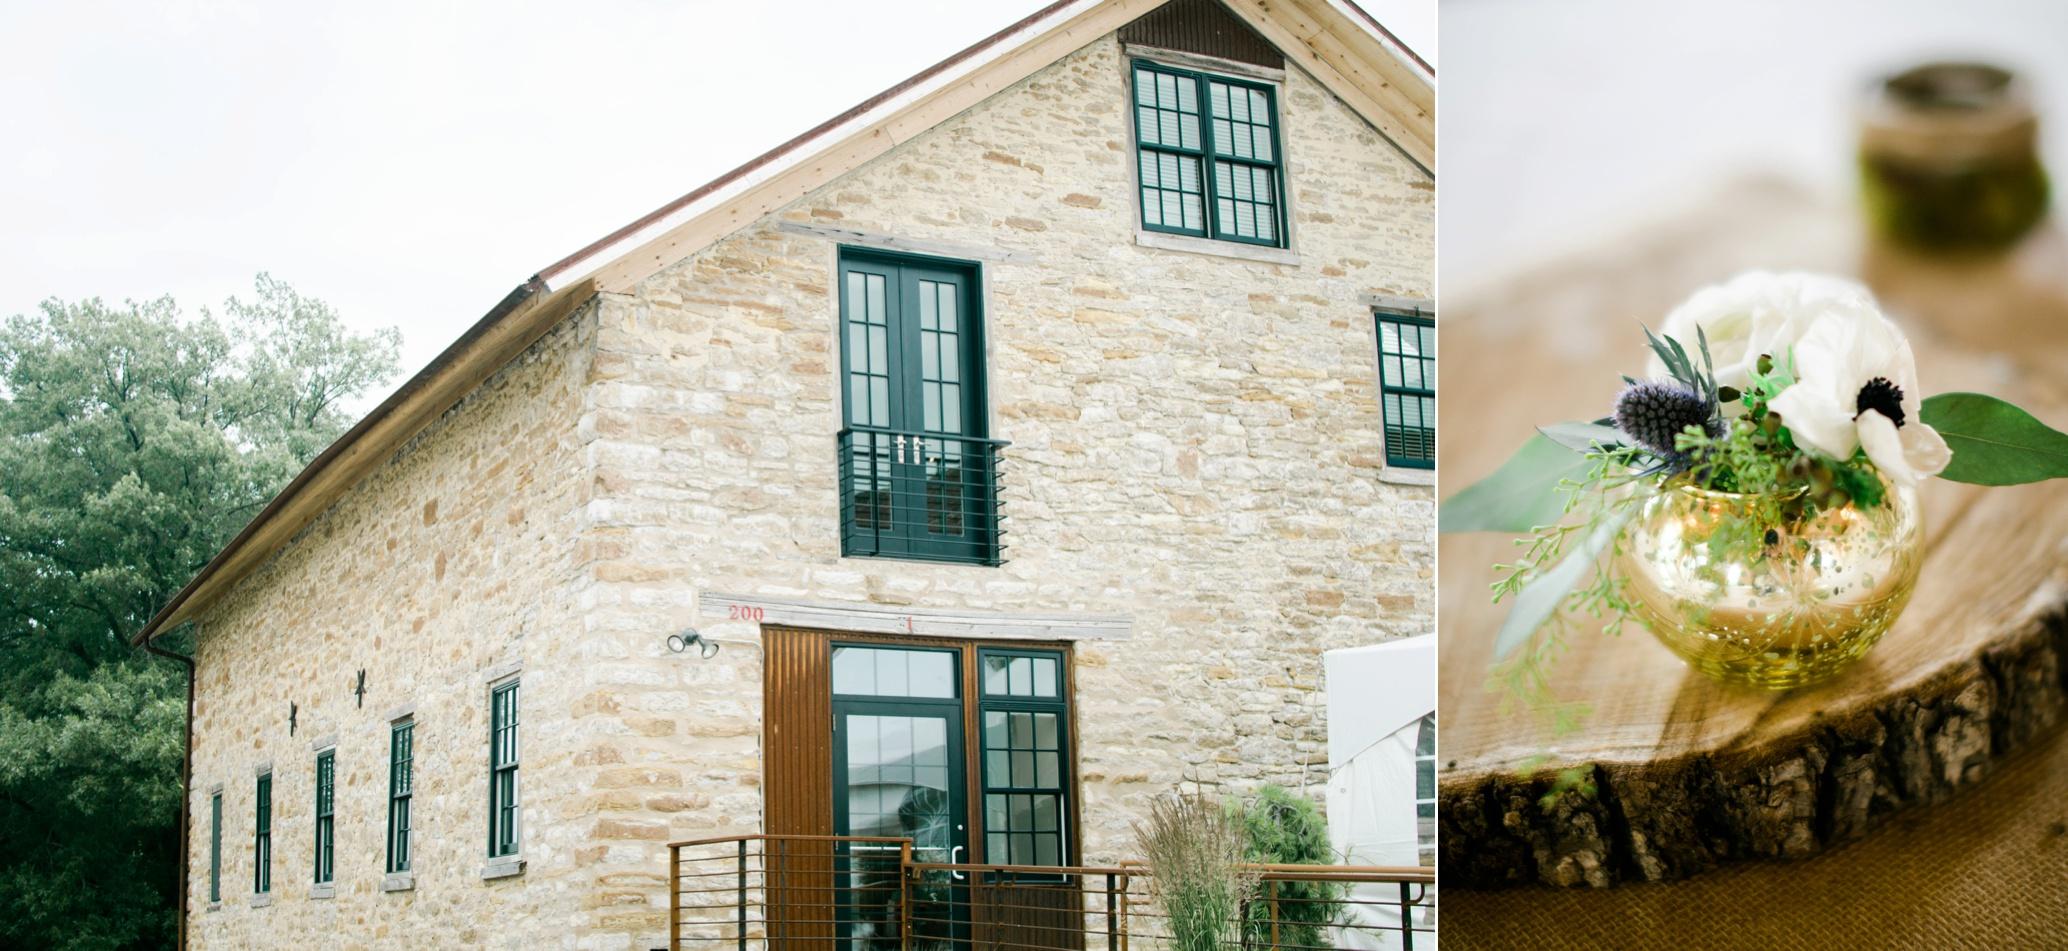 Palmer House and Stable Solon, IA | Ali Leigh Photo Minneapolis Wedding Photographer_0231.jpg